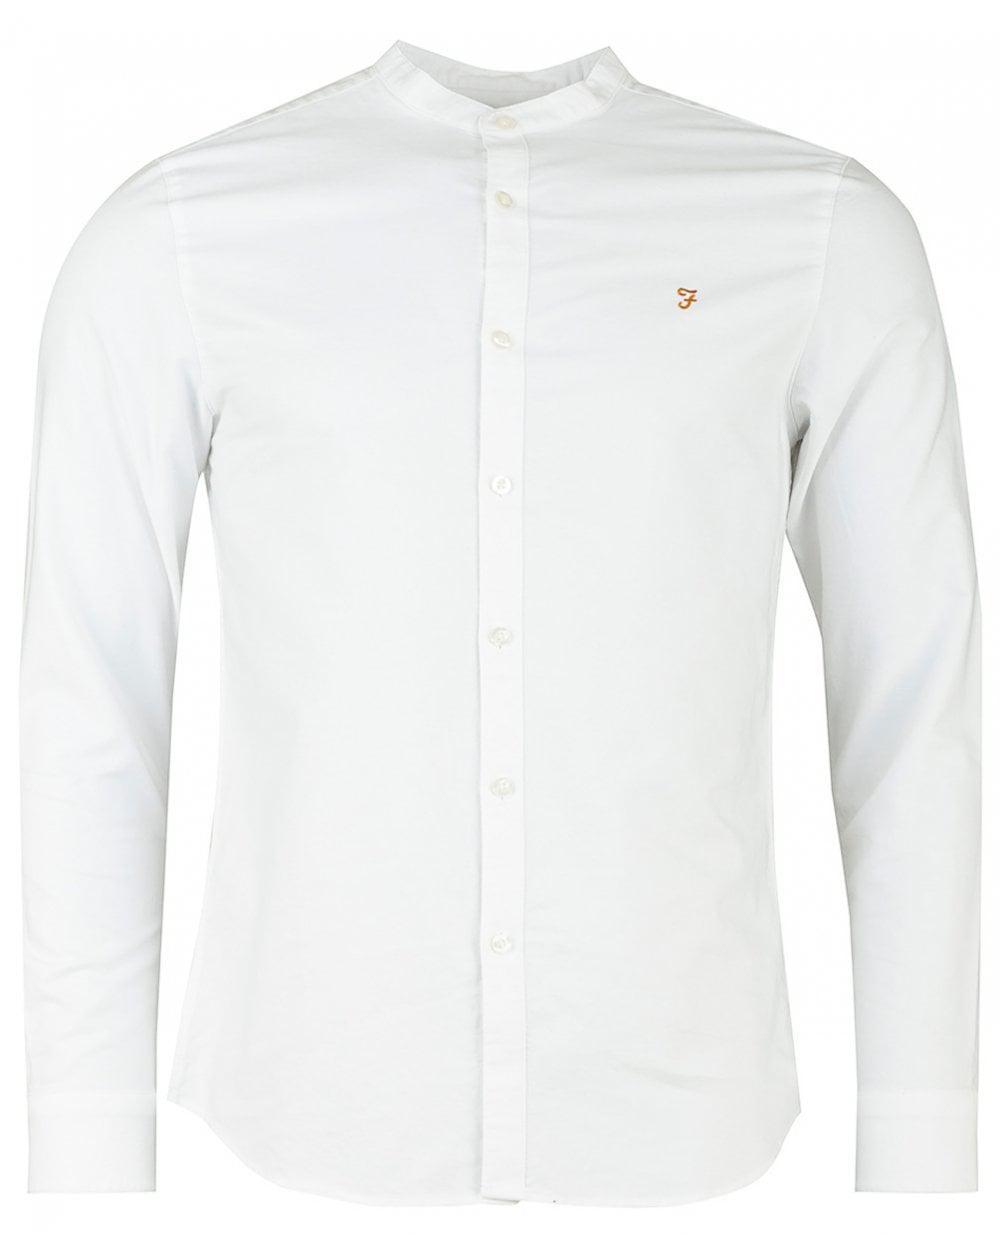 330eb503fd3 Farah Brewer Grandad Collar Slim Oxford Shirt in White for Men - Lyst